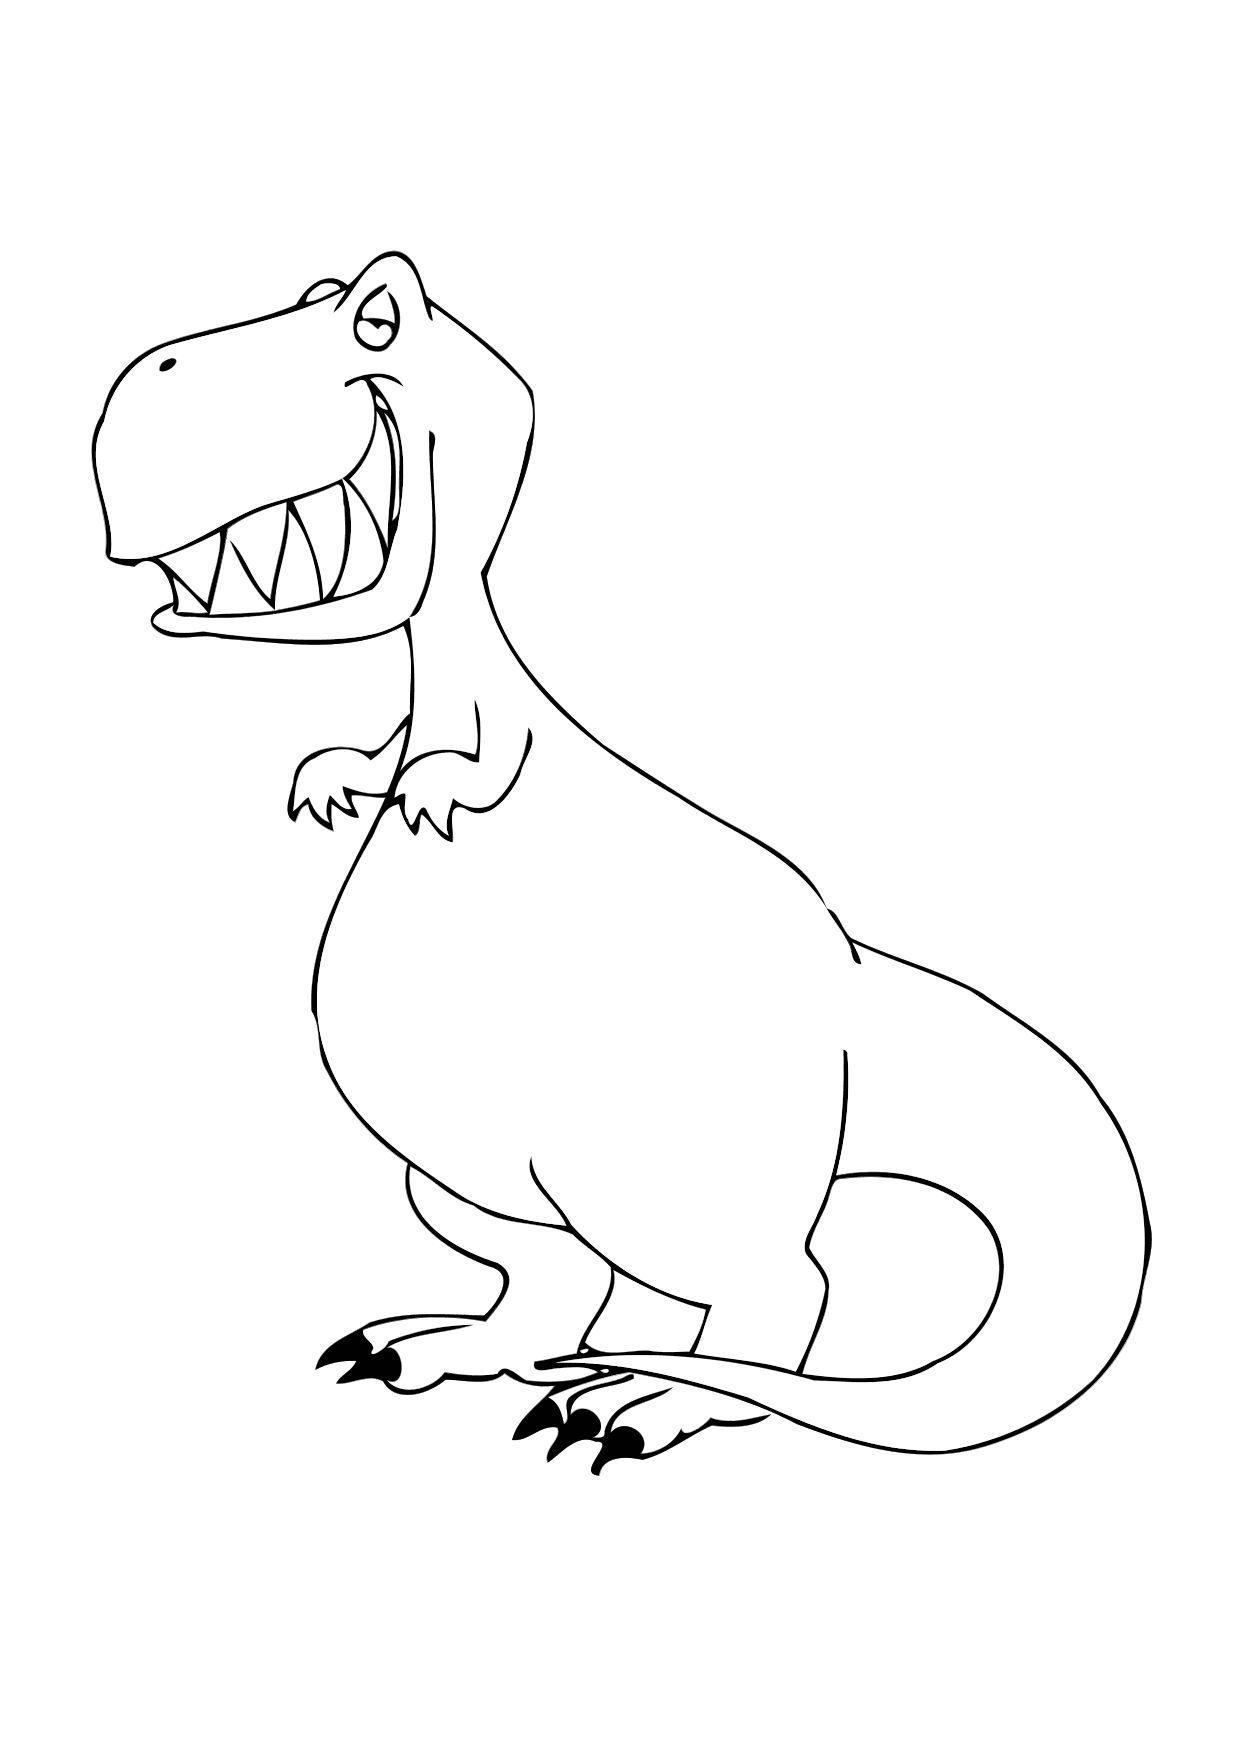 Kleurplaat Dinosaurus Gratis Kleurplaten Om Te Printen Afb 12506